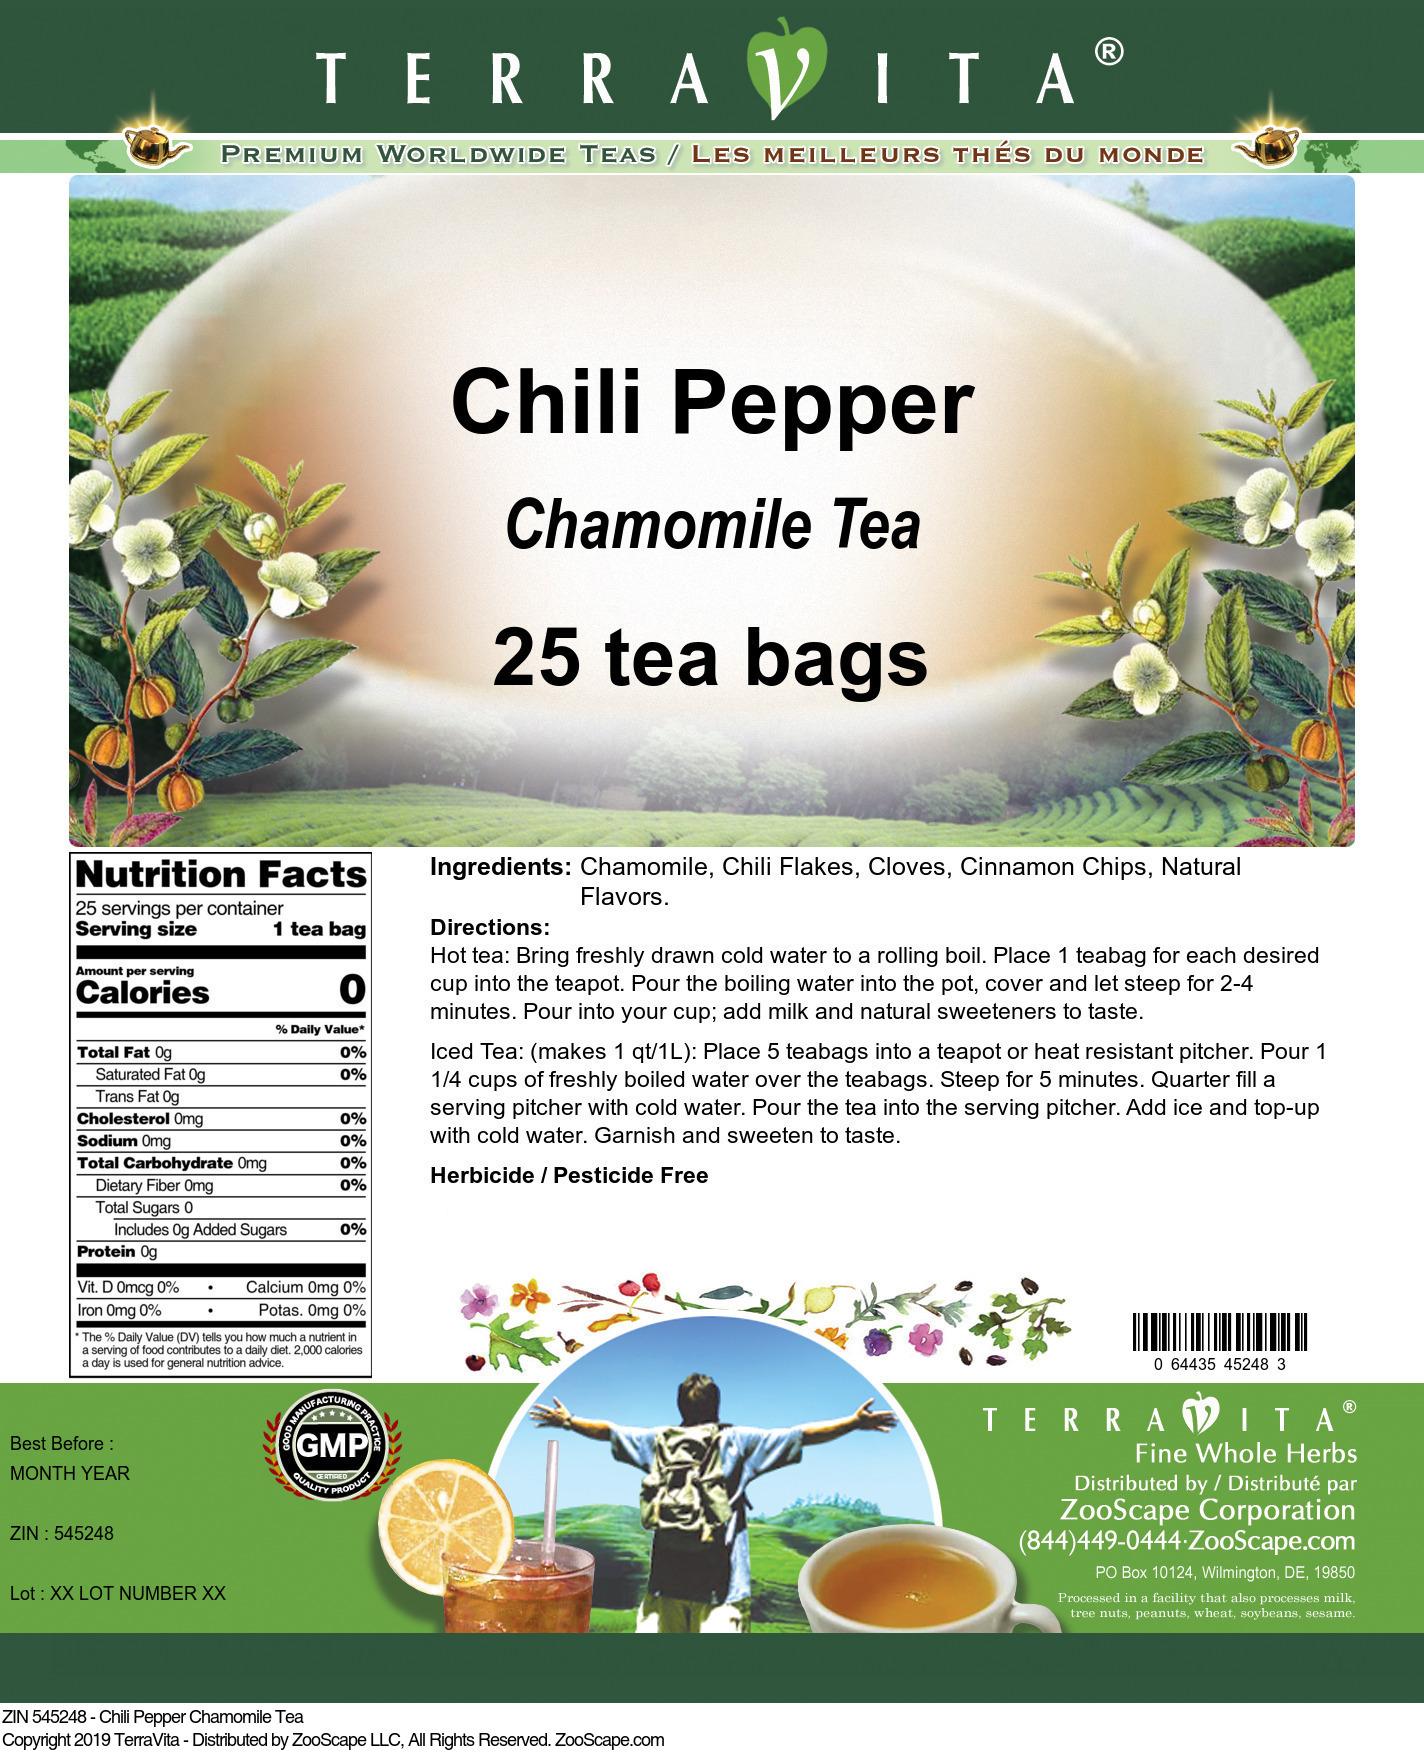 Chili Pepper Chamomile Tea